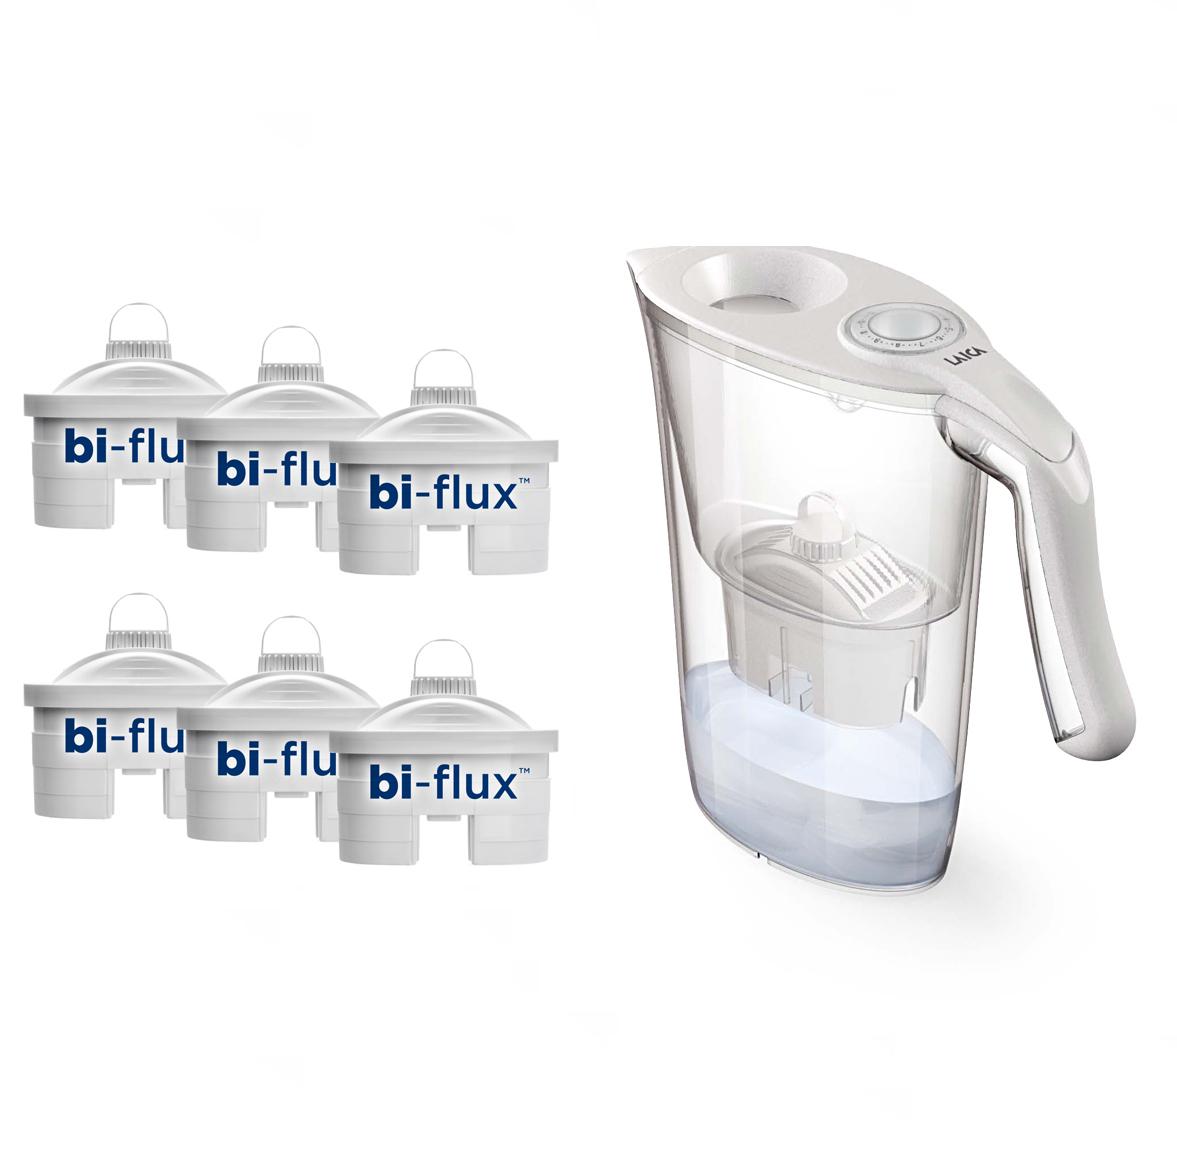 PROMO: 6 cartuse + Cana filtranta de apa CADOU, 2,3 litri laicashop.ro 2021